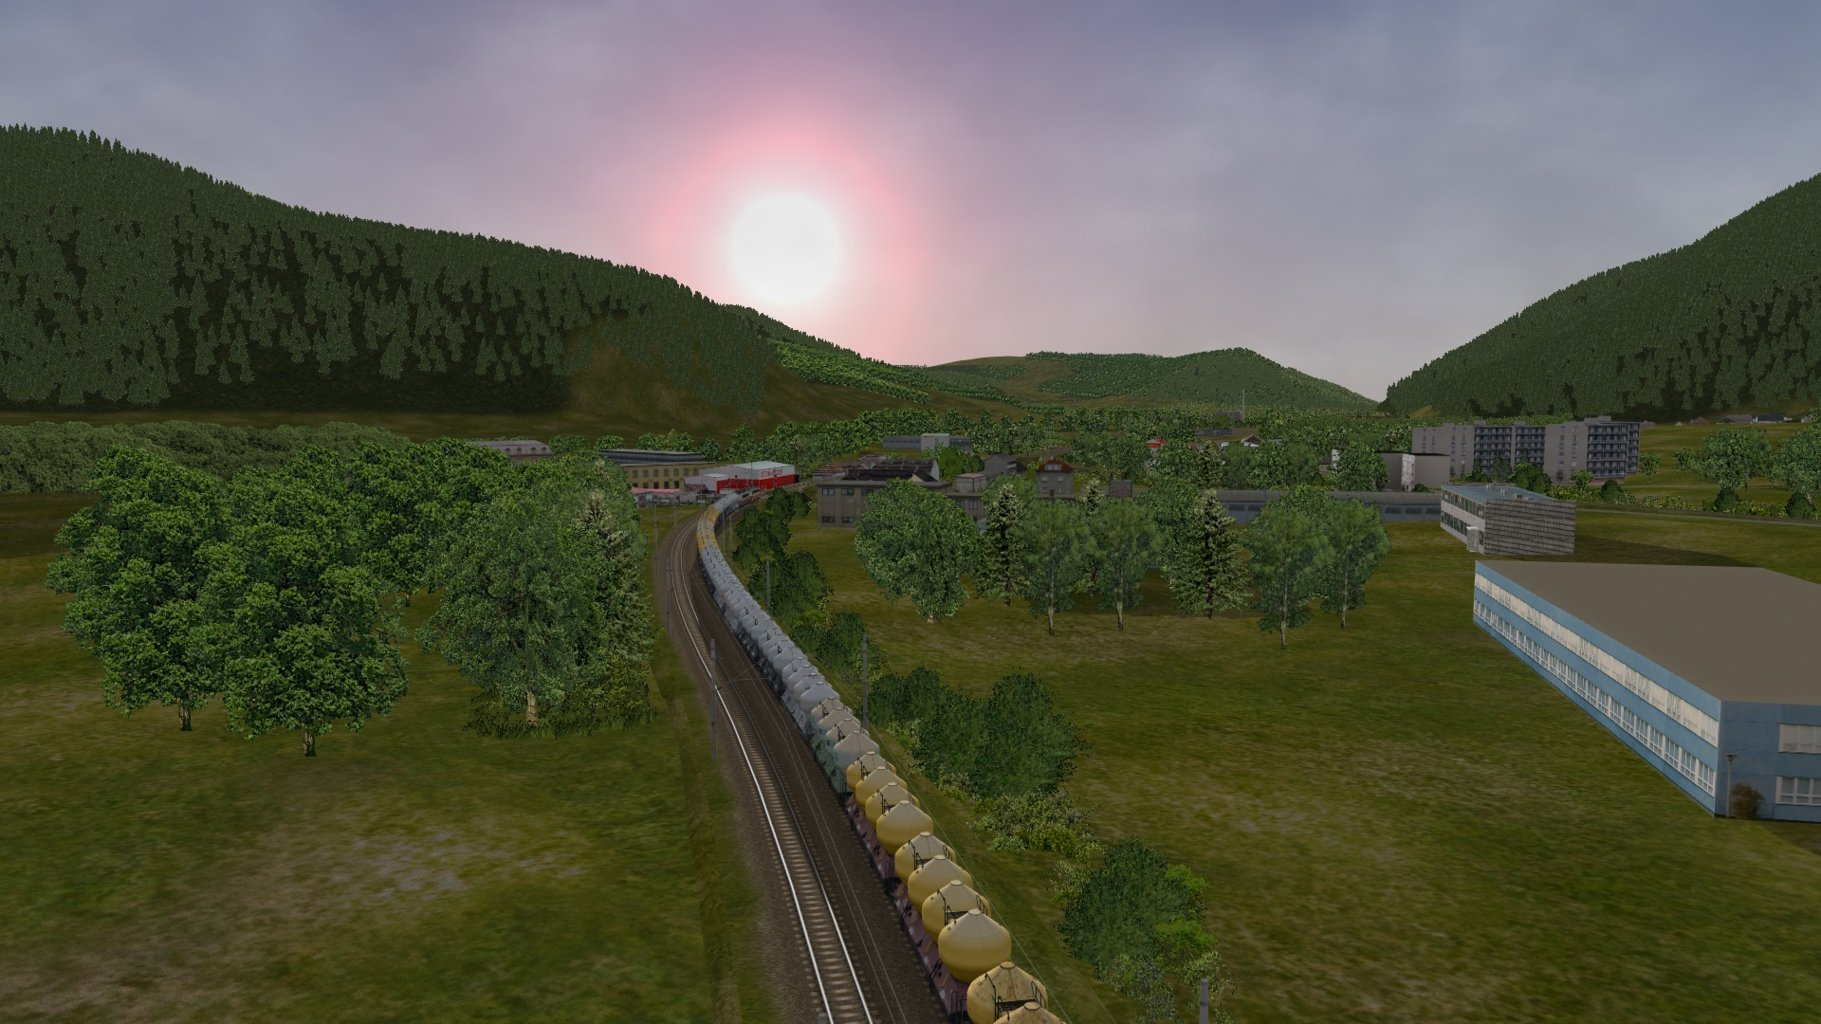 Open Rails 2021-04-06 08-35-19.jpg